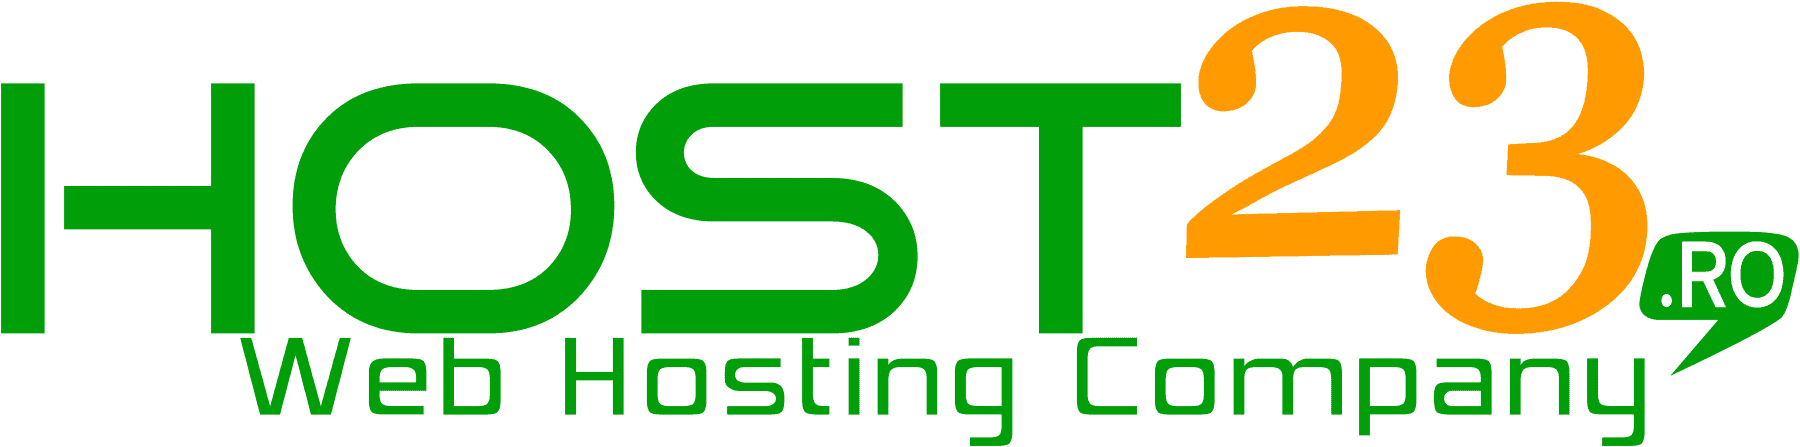 Host23